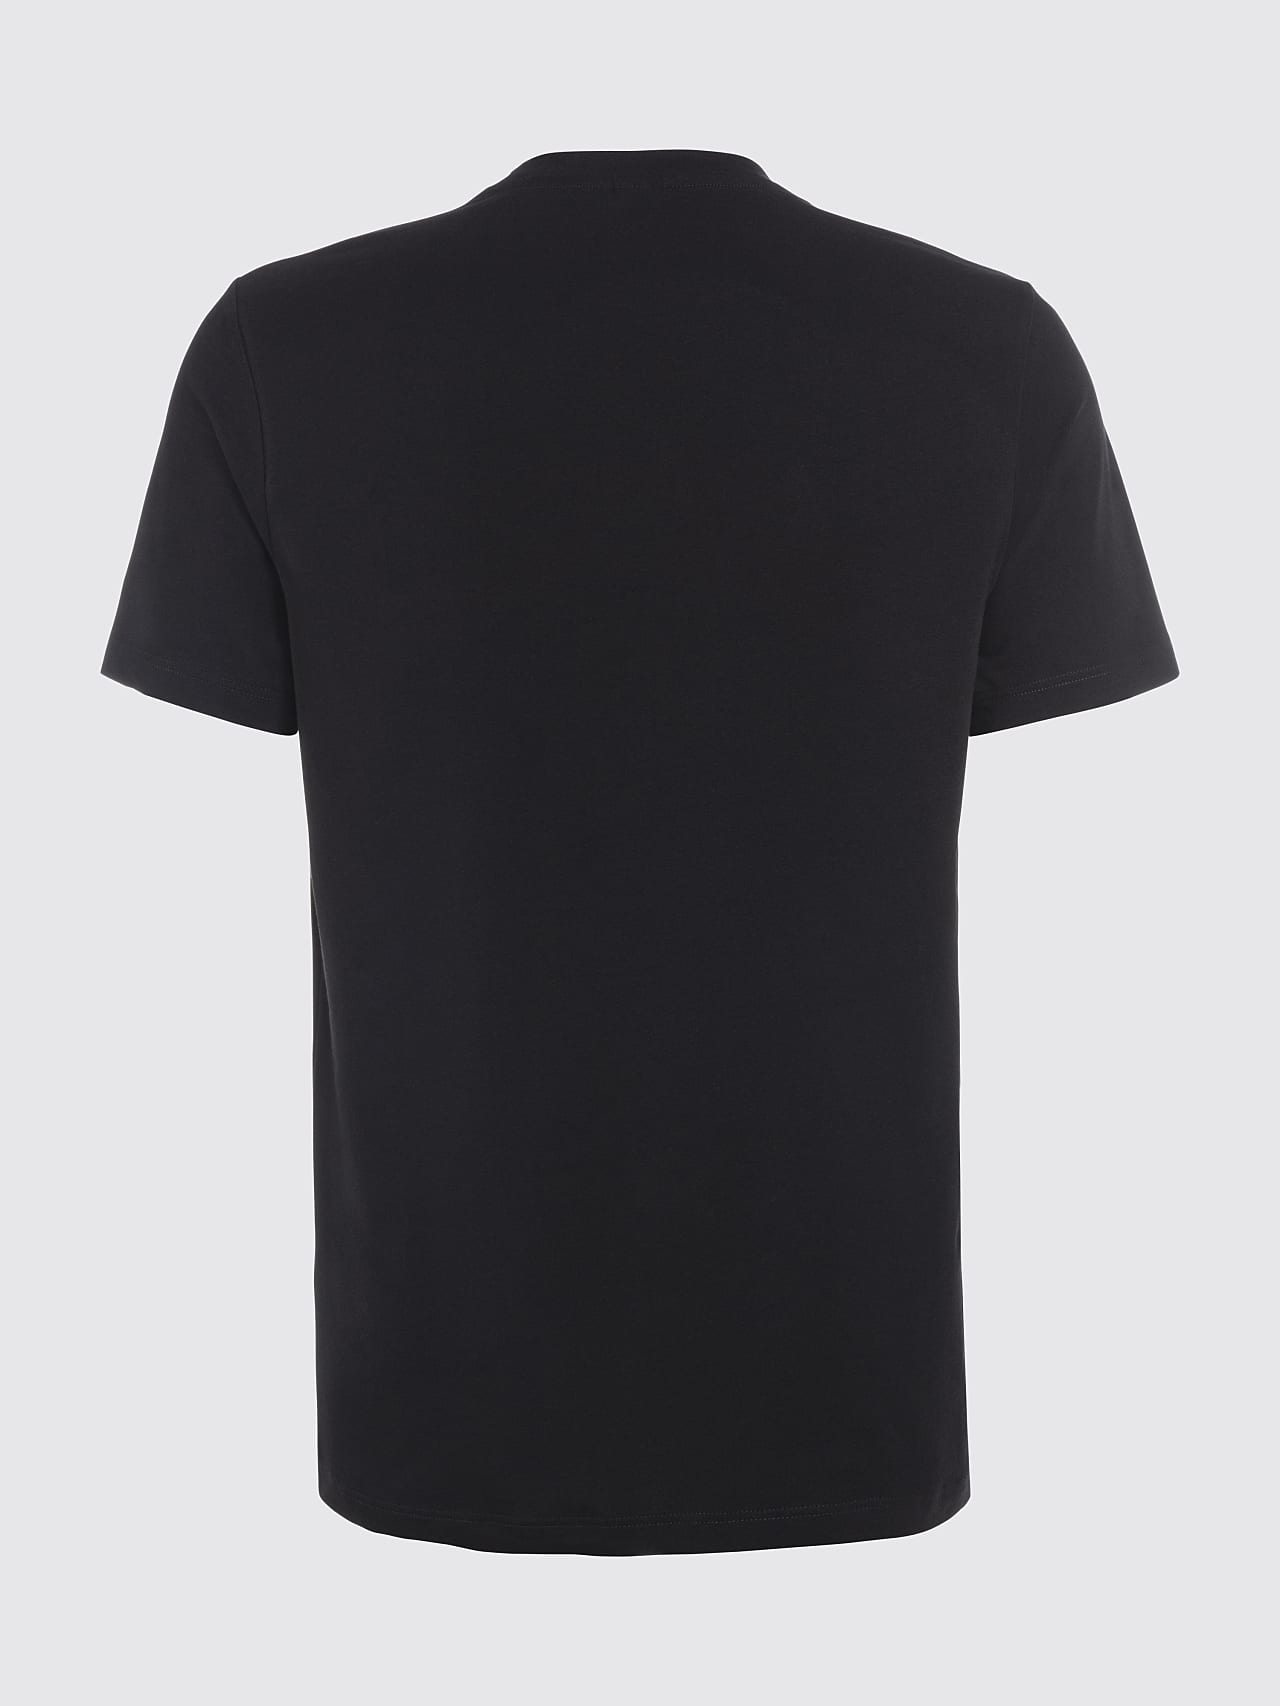 JERO V2.Y4.02 Signature Logo T-Shirt black Left Alpha Tauri